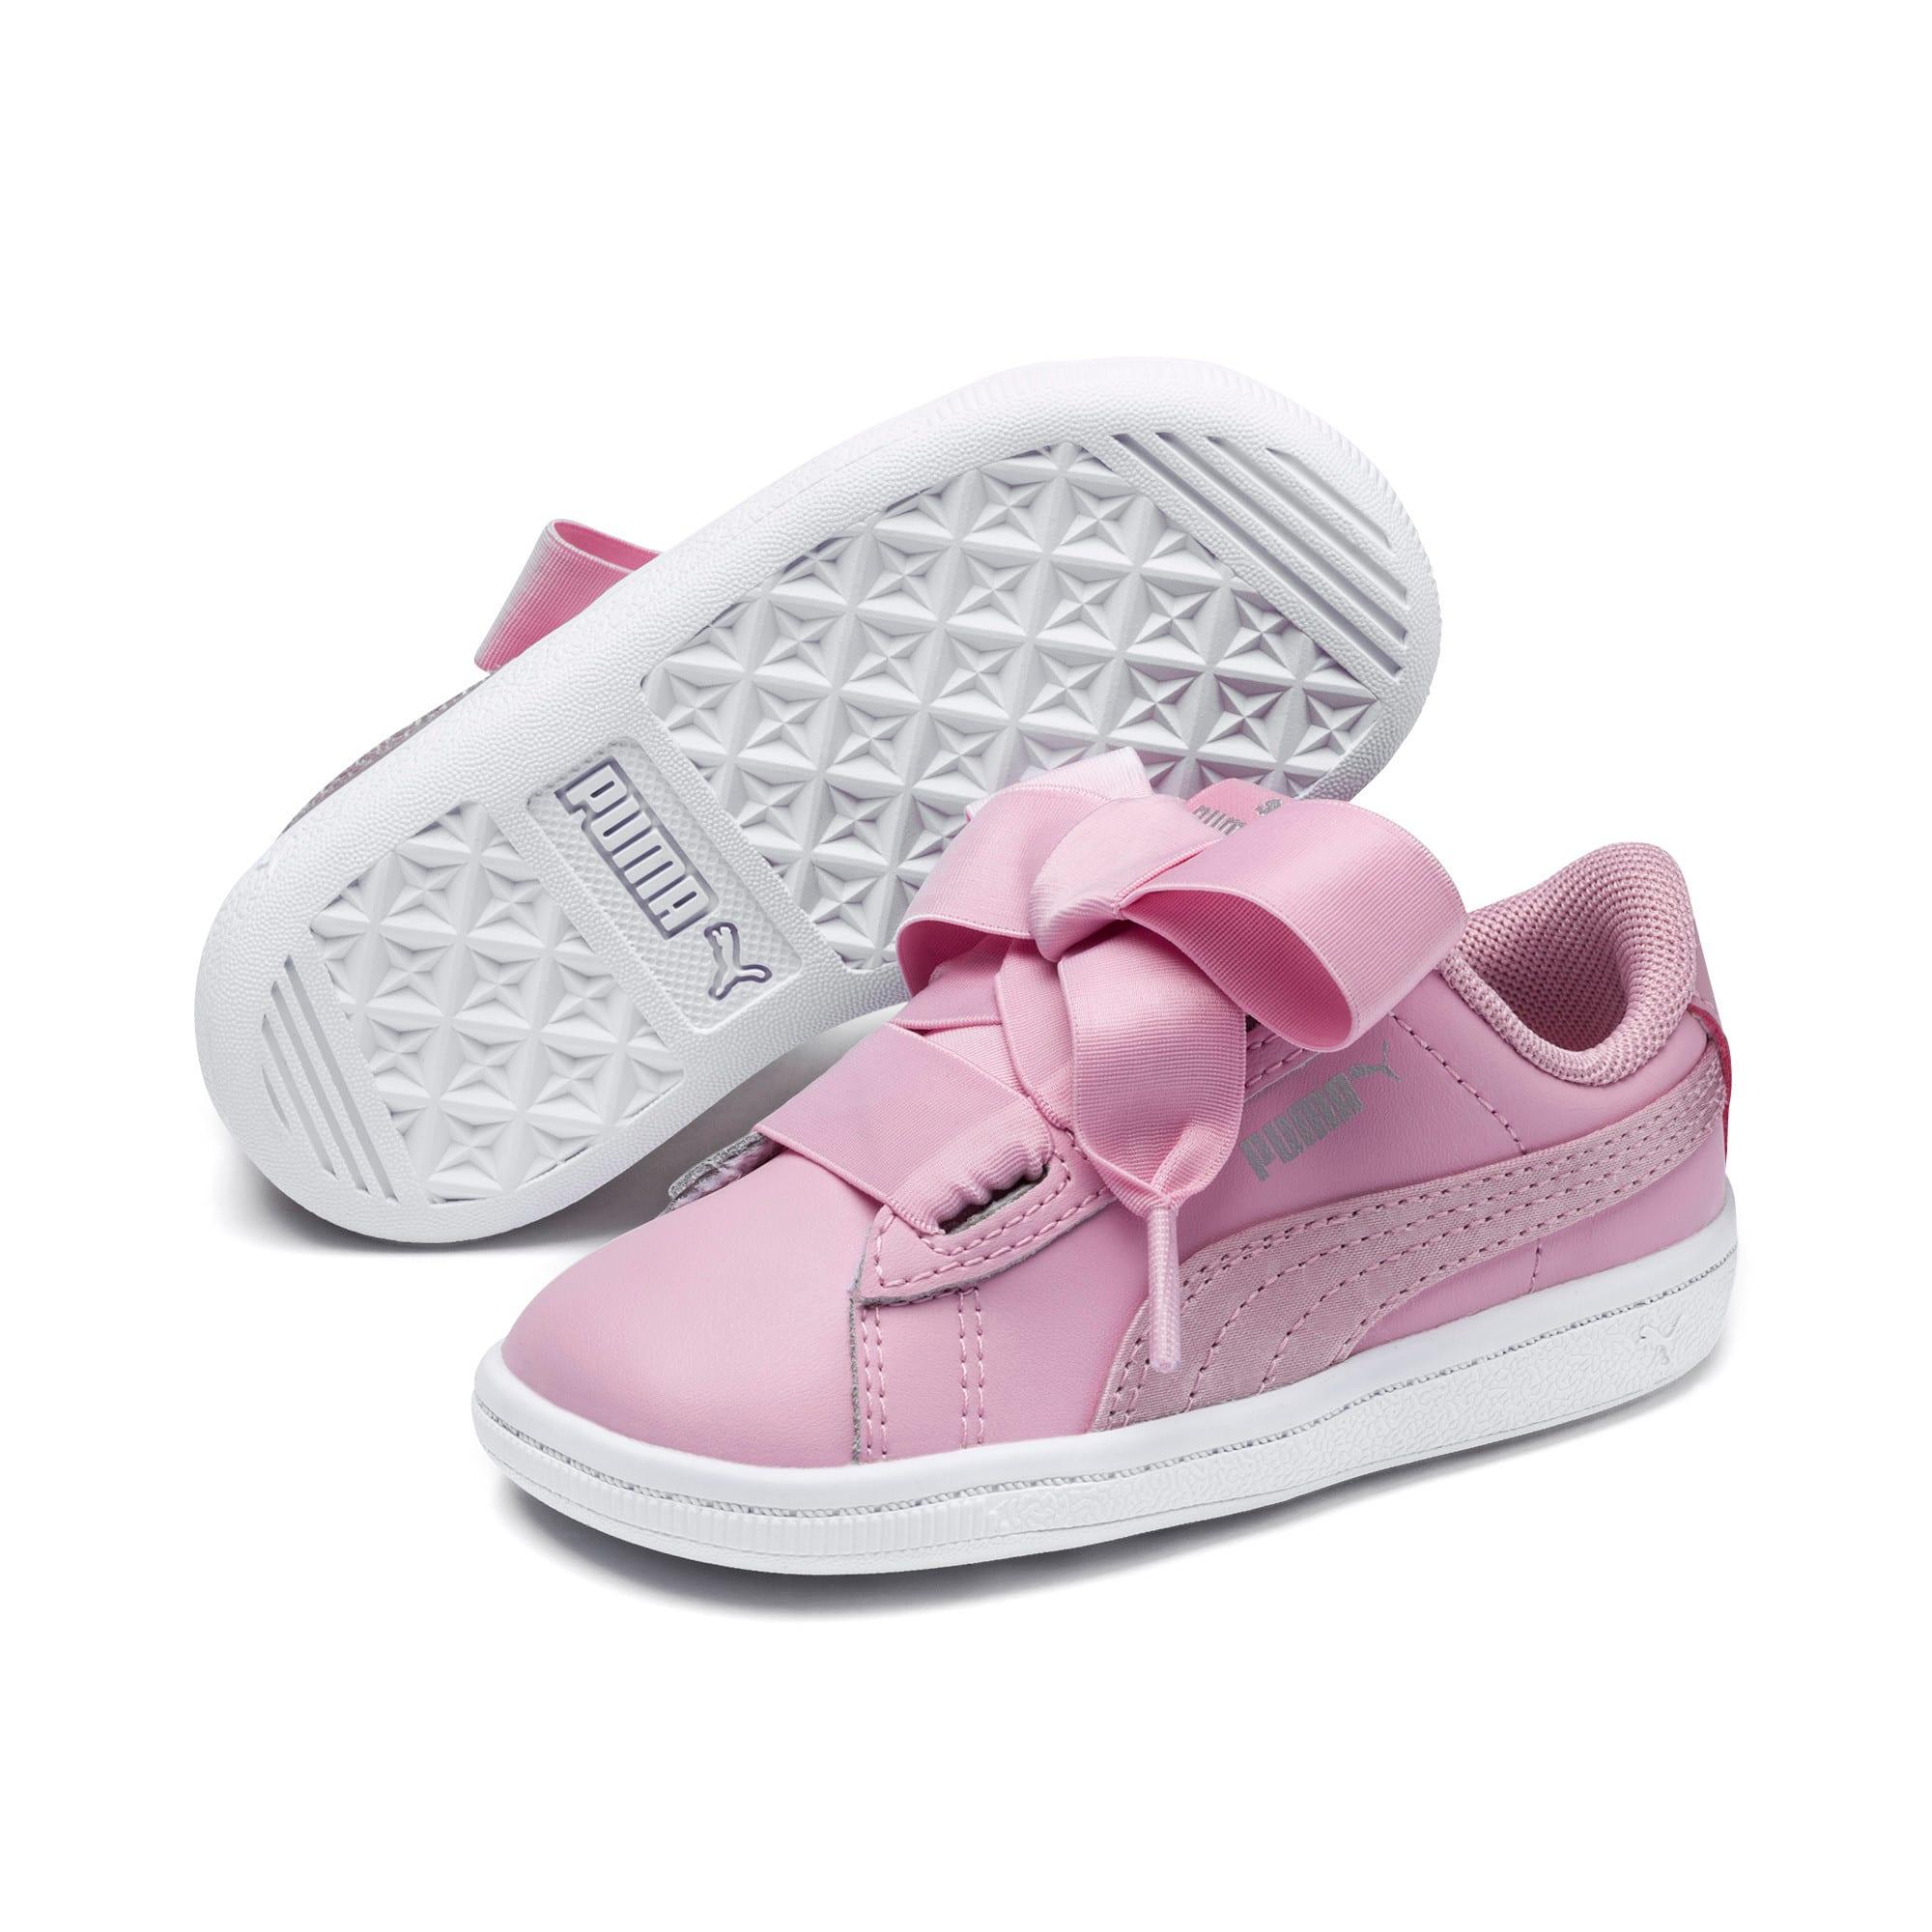 Miniatura 2 de ZapatosPUMA Vikky Ribbon Satin AC para niños, Pale Pink-Pale Pink, mediano